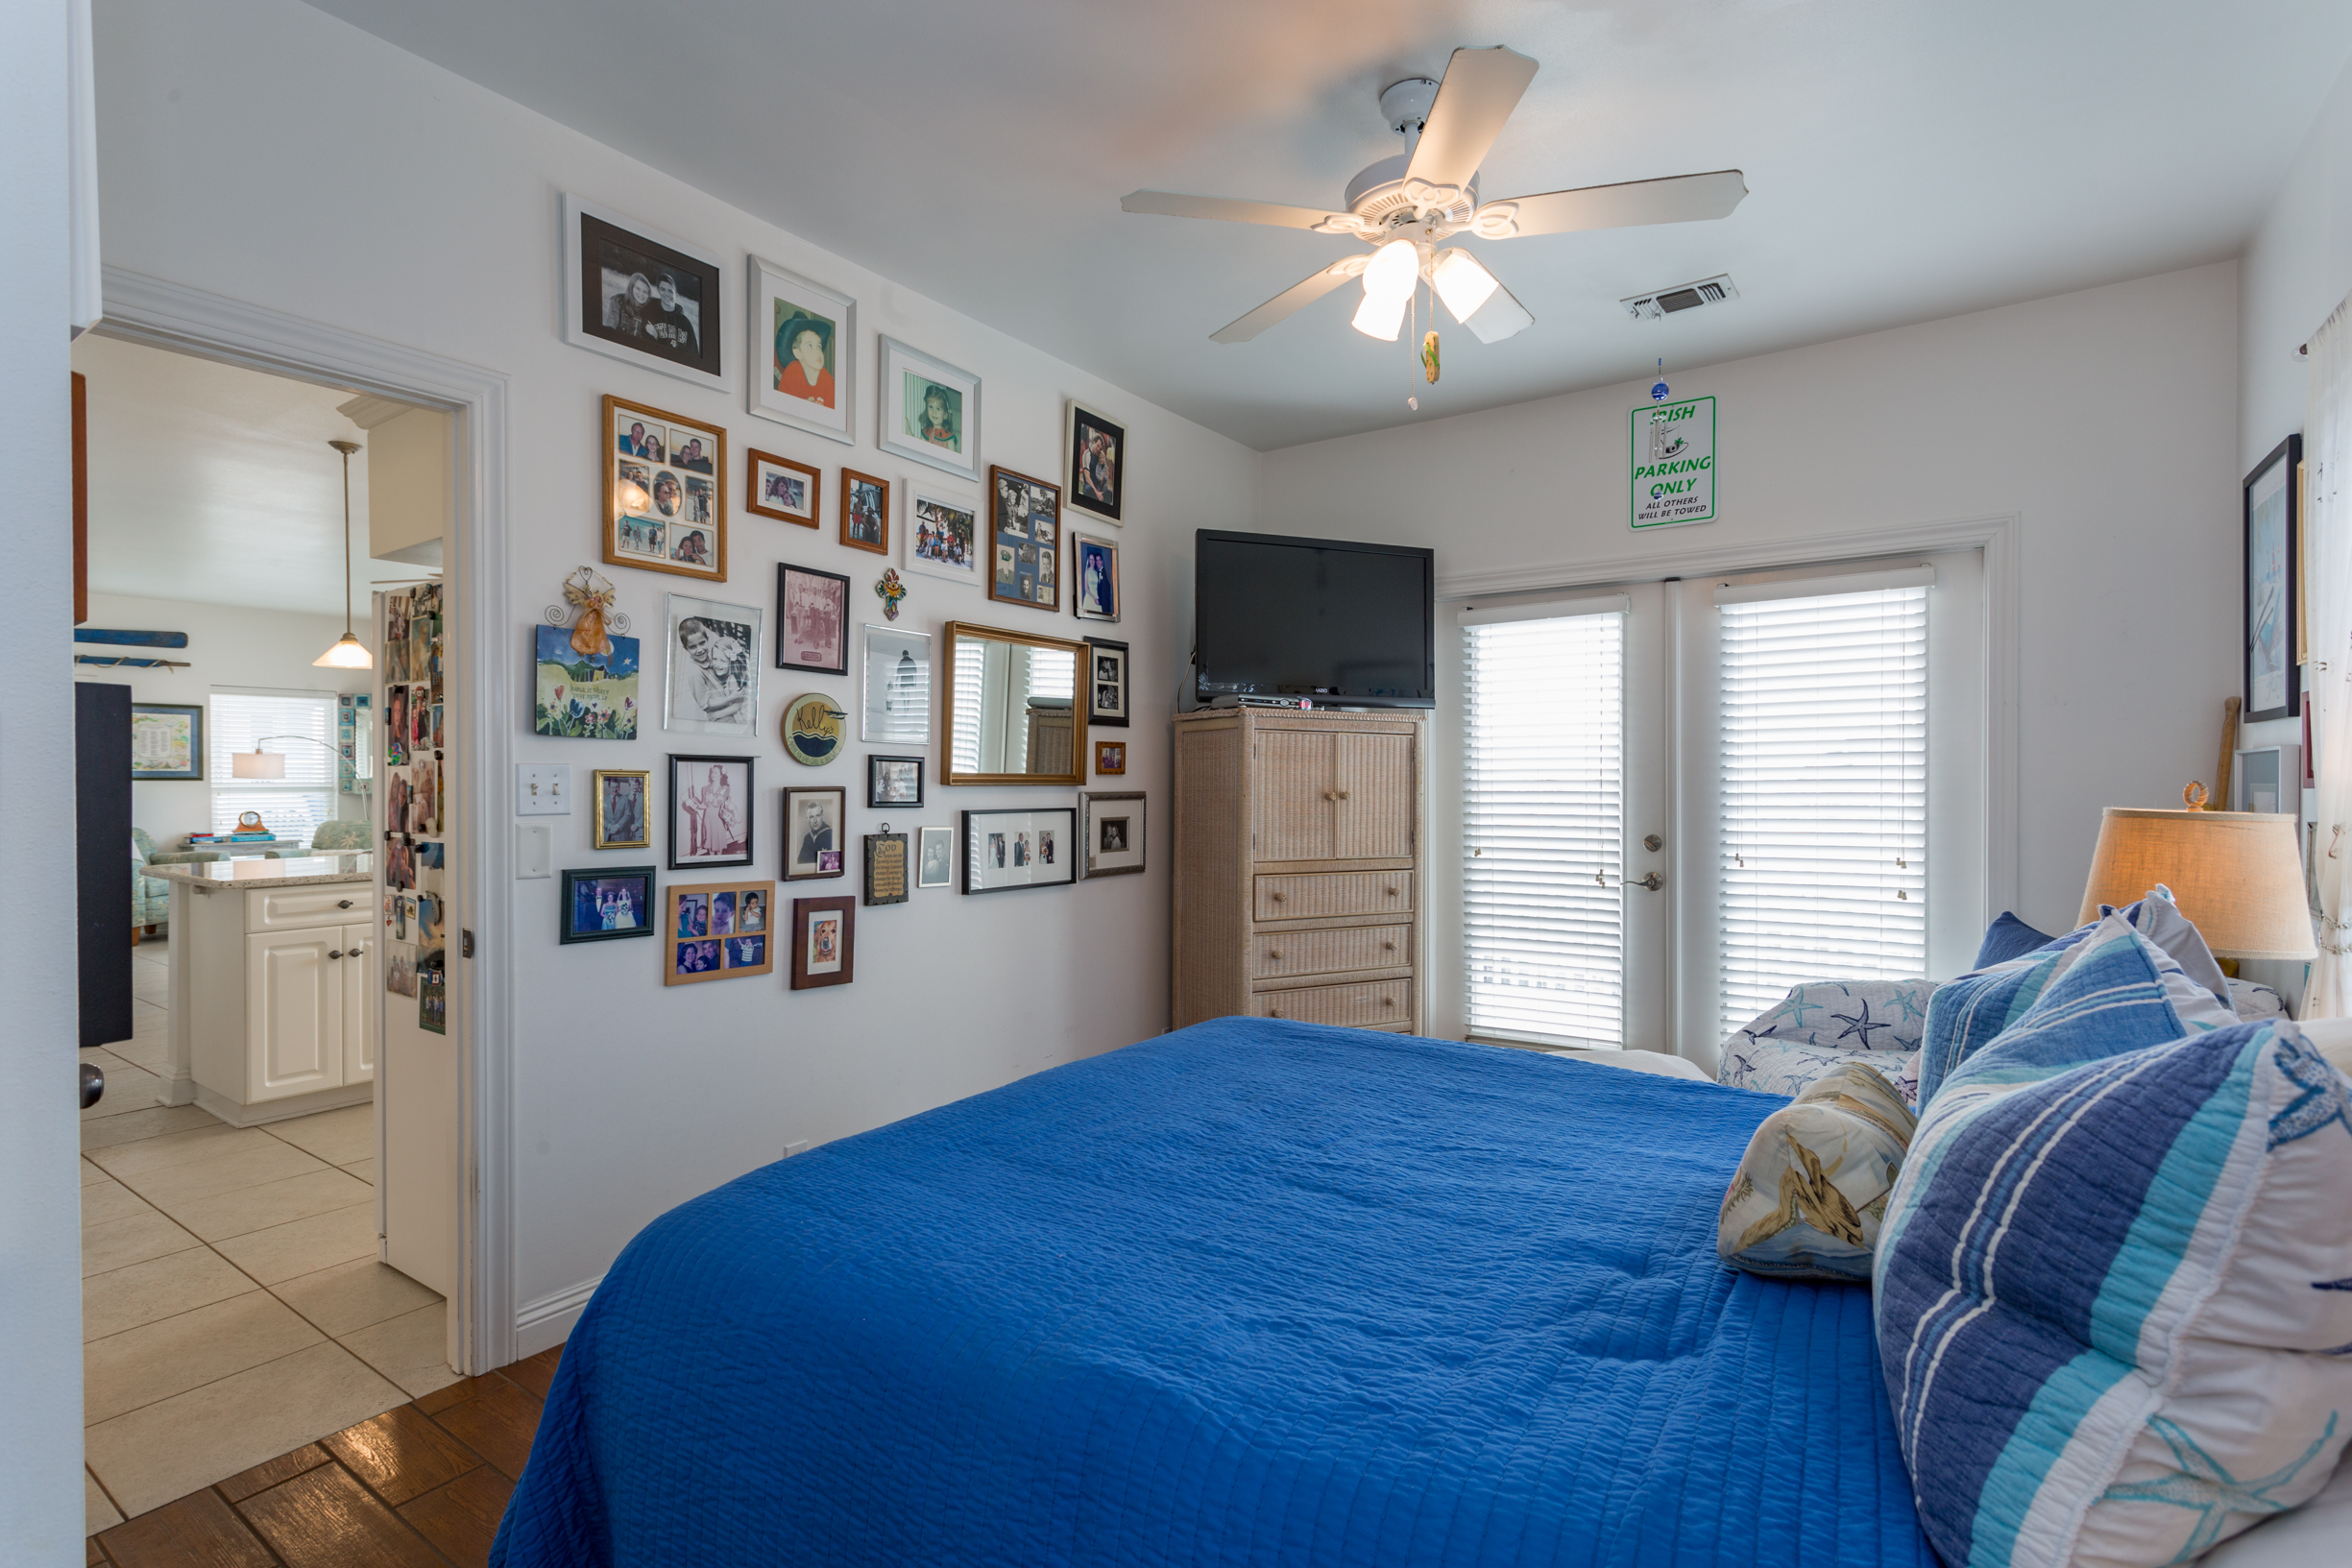 White Sands Cottage 501 Life's a Beach House Townhouse rental in White Sands Pensacola Beach in Pensacola Beach Florida - #20